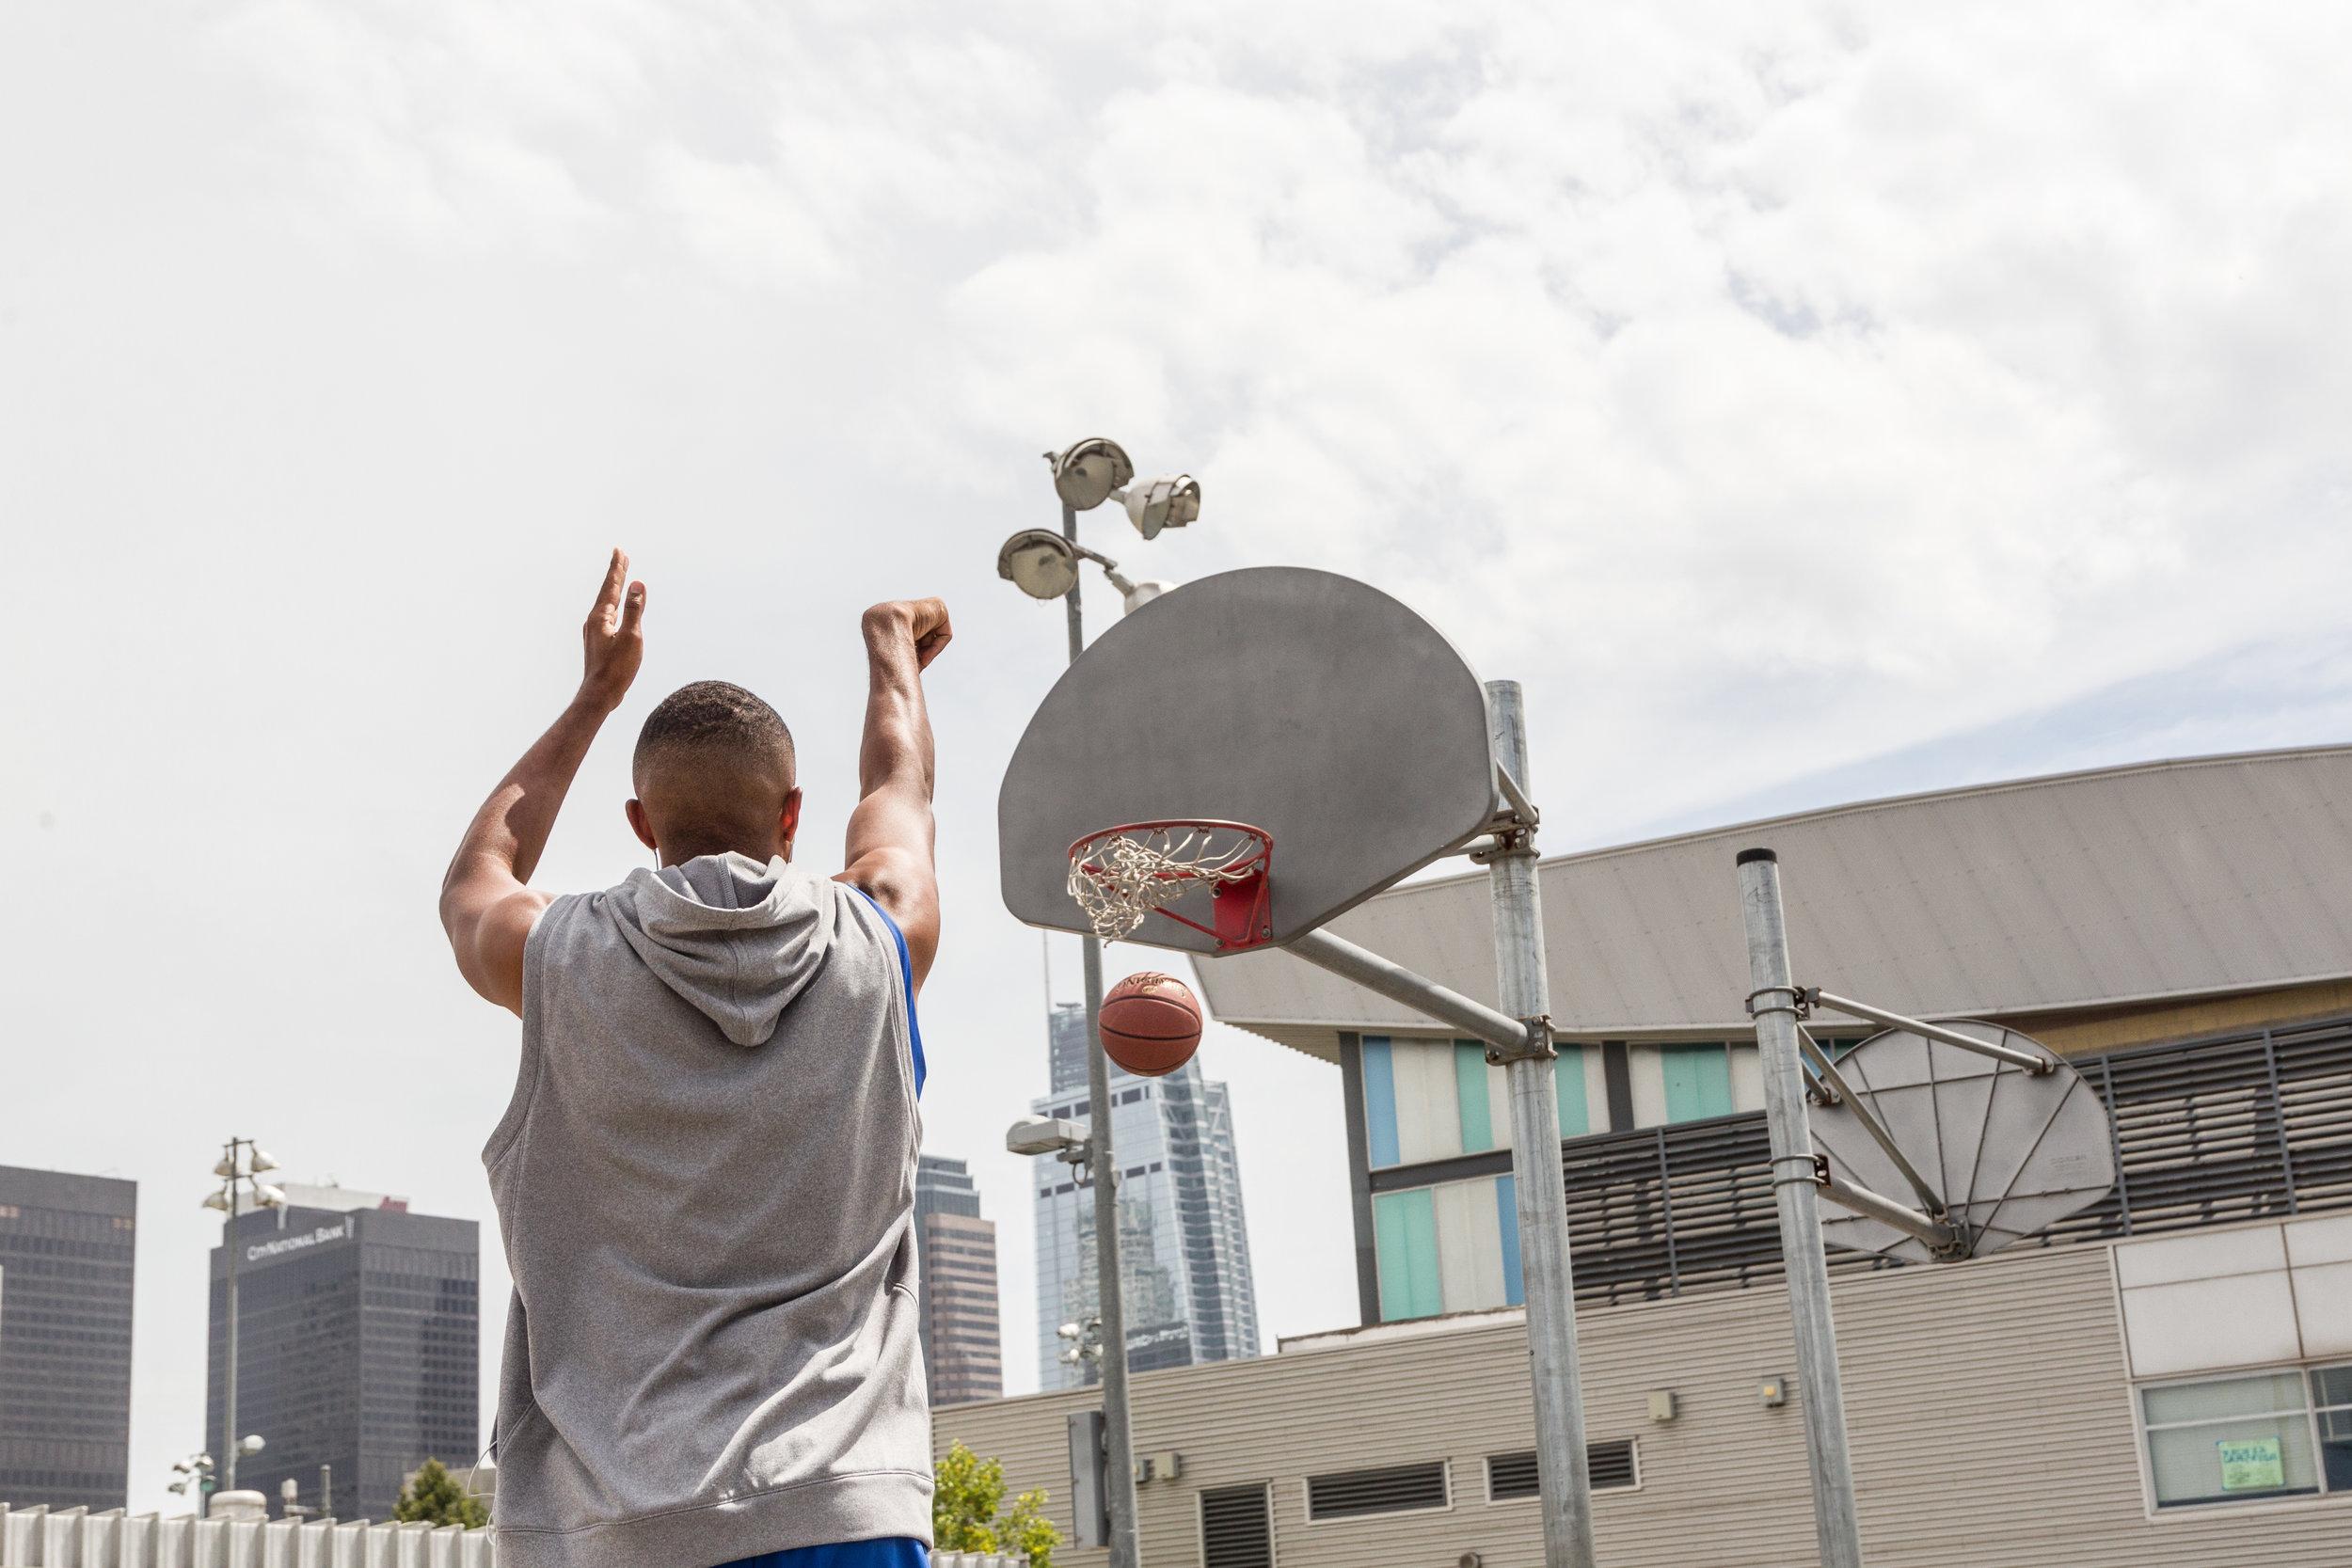 urban-basketball-029.jpg